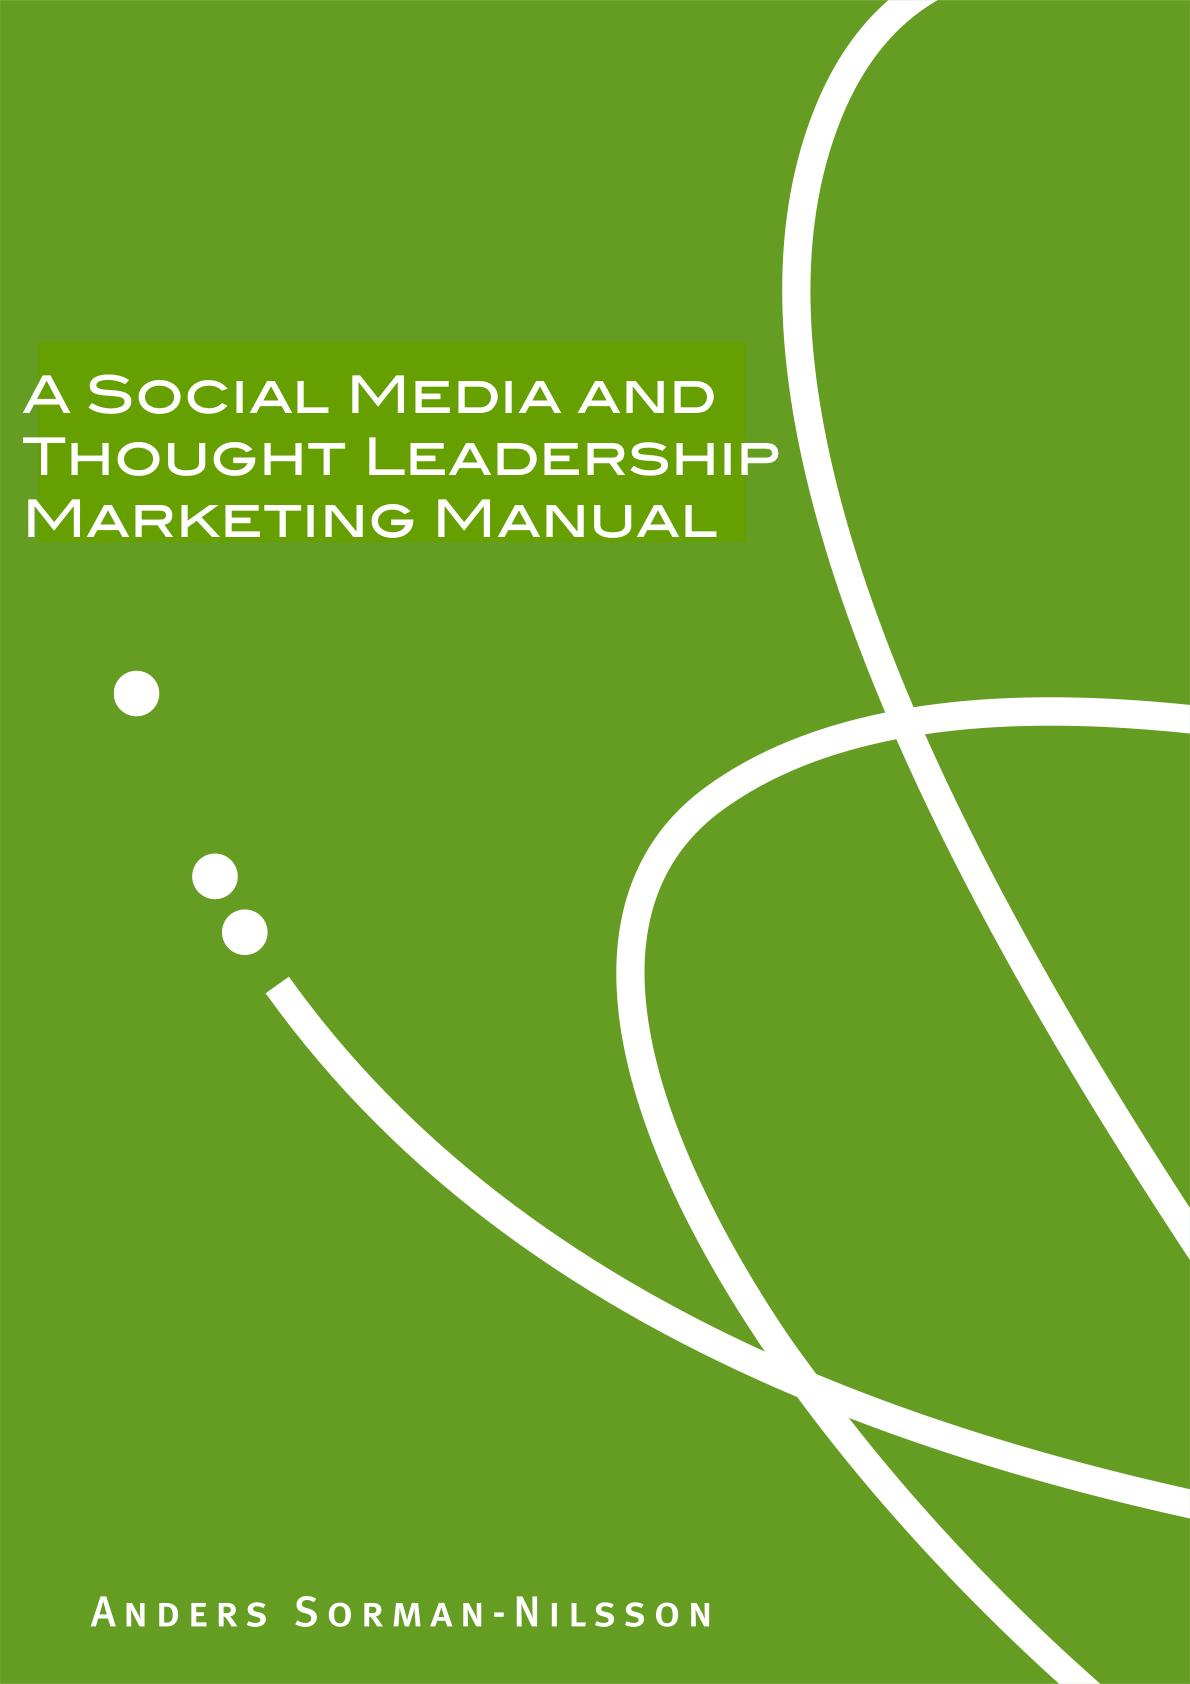 A Social Media and Thought Leadership Marketing Manual